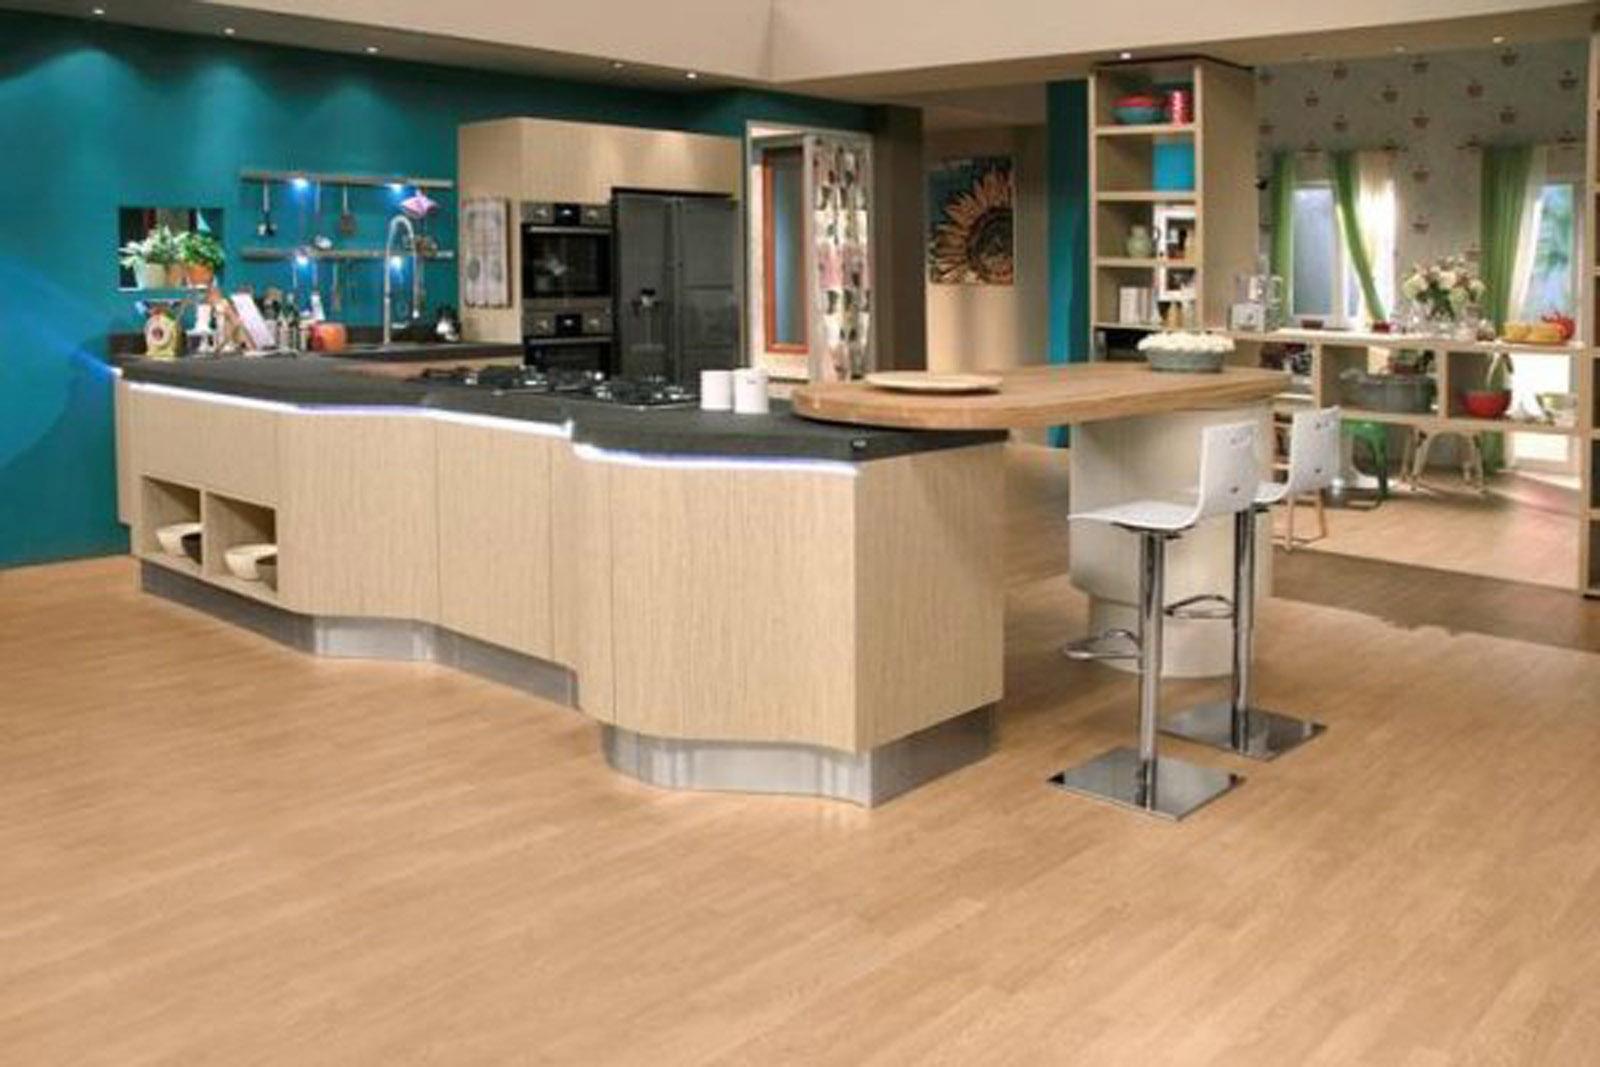 Le cucine pi belle del mondo - Cucine lussuose moderne ...